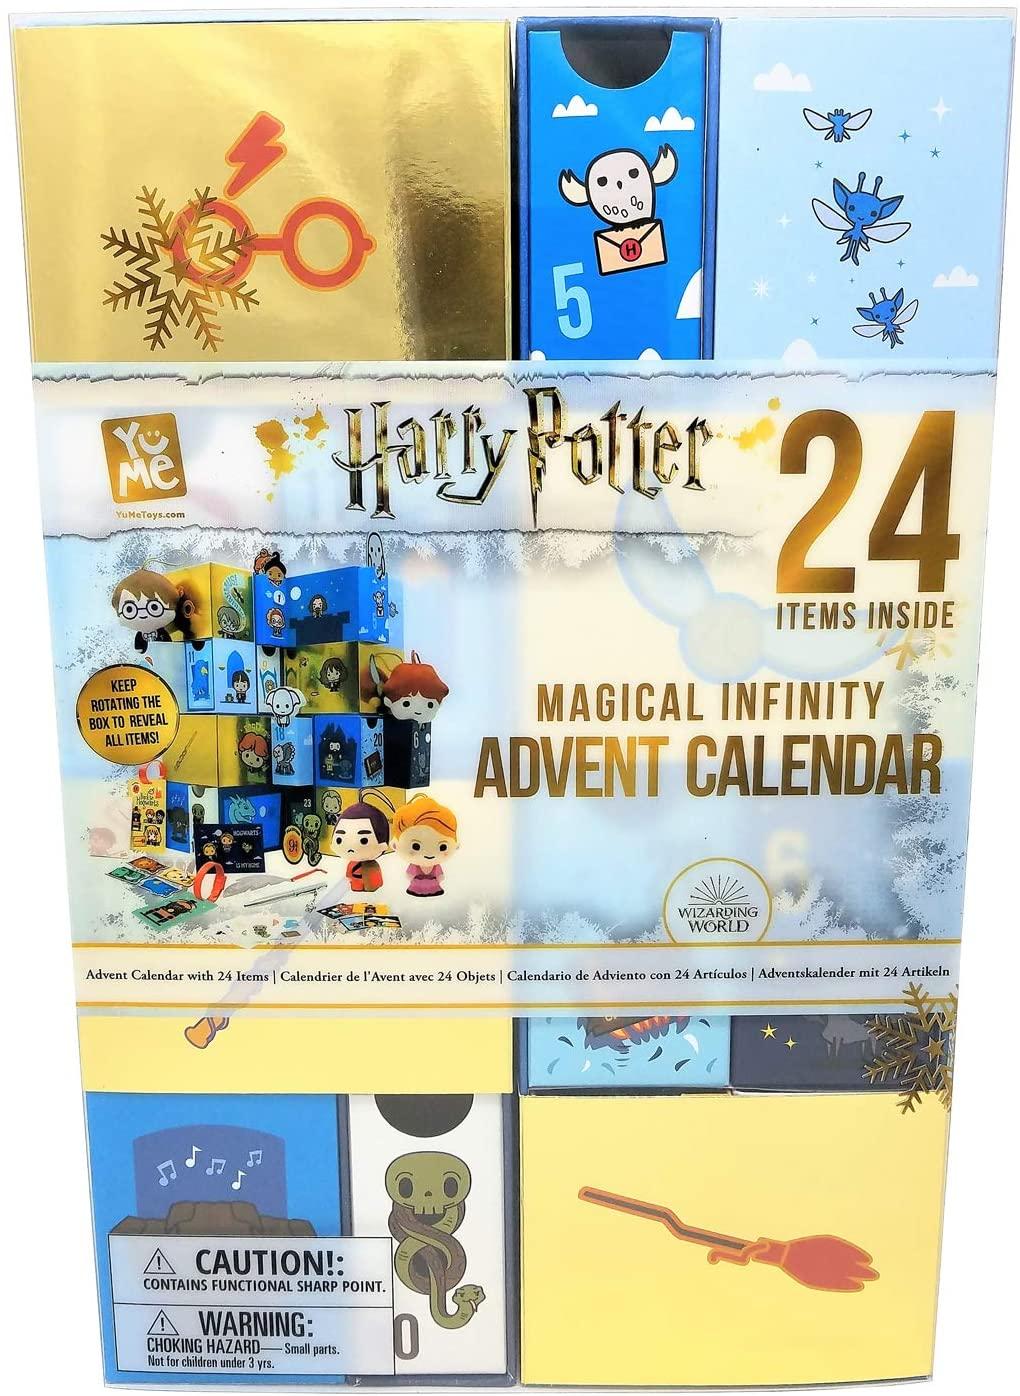 Harry Potter Magical Infinity Advent Calendar 2019